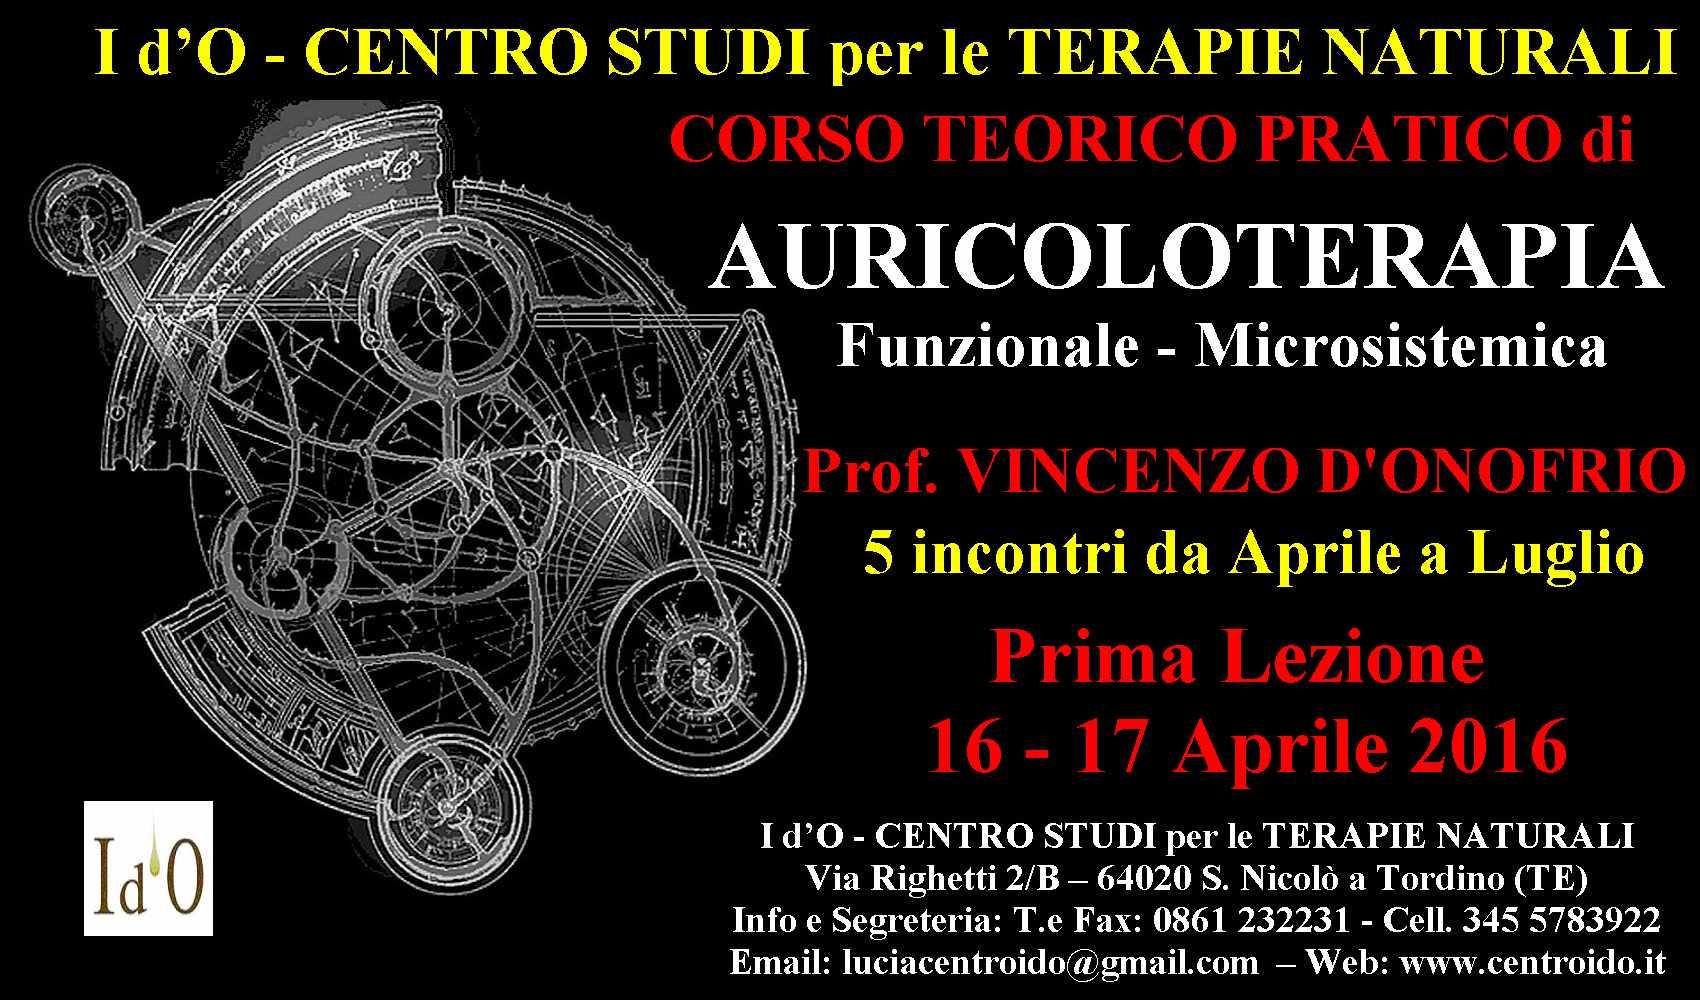 Auricolo2